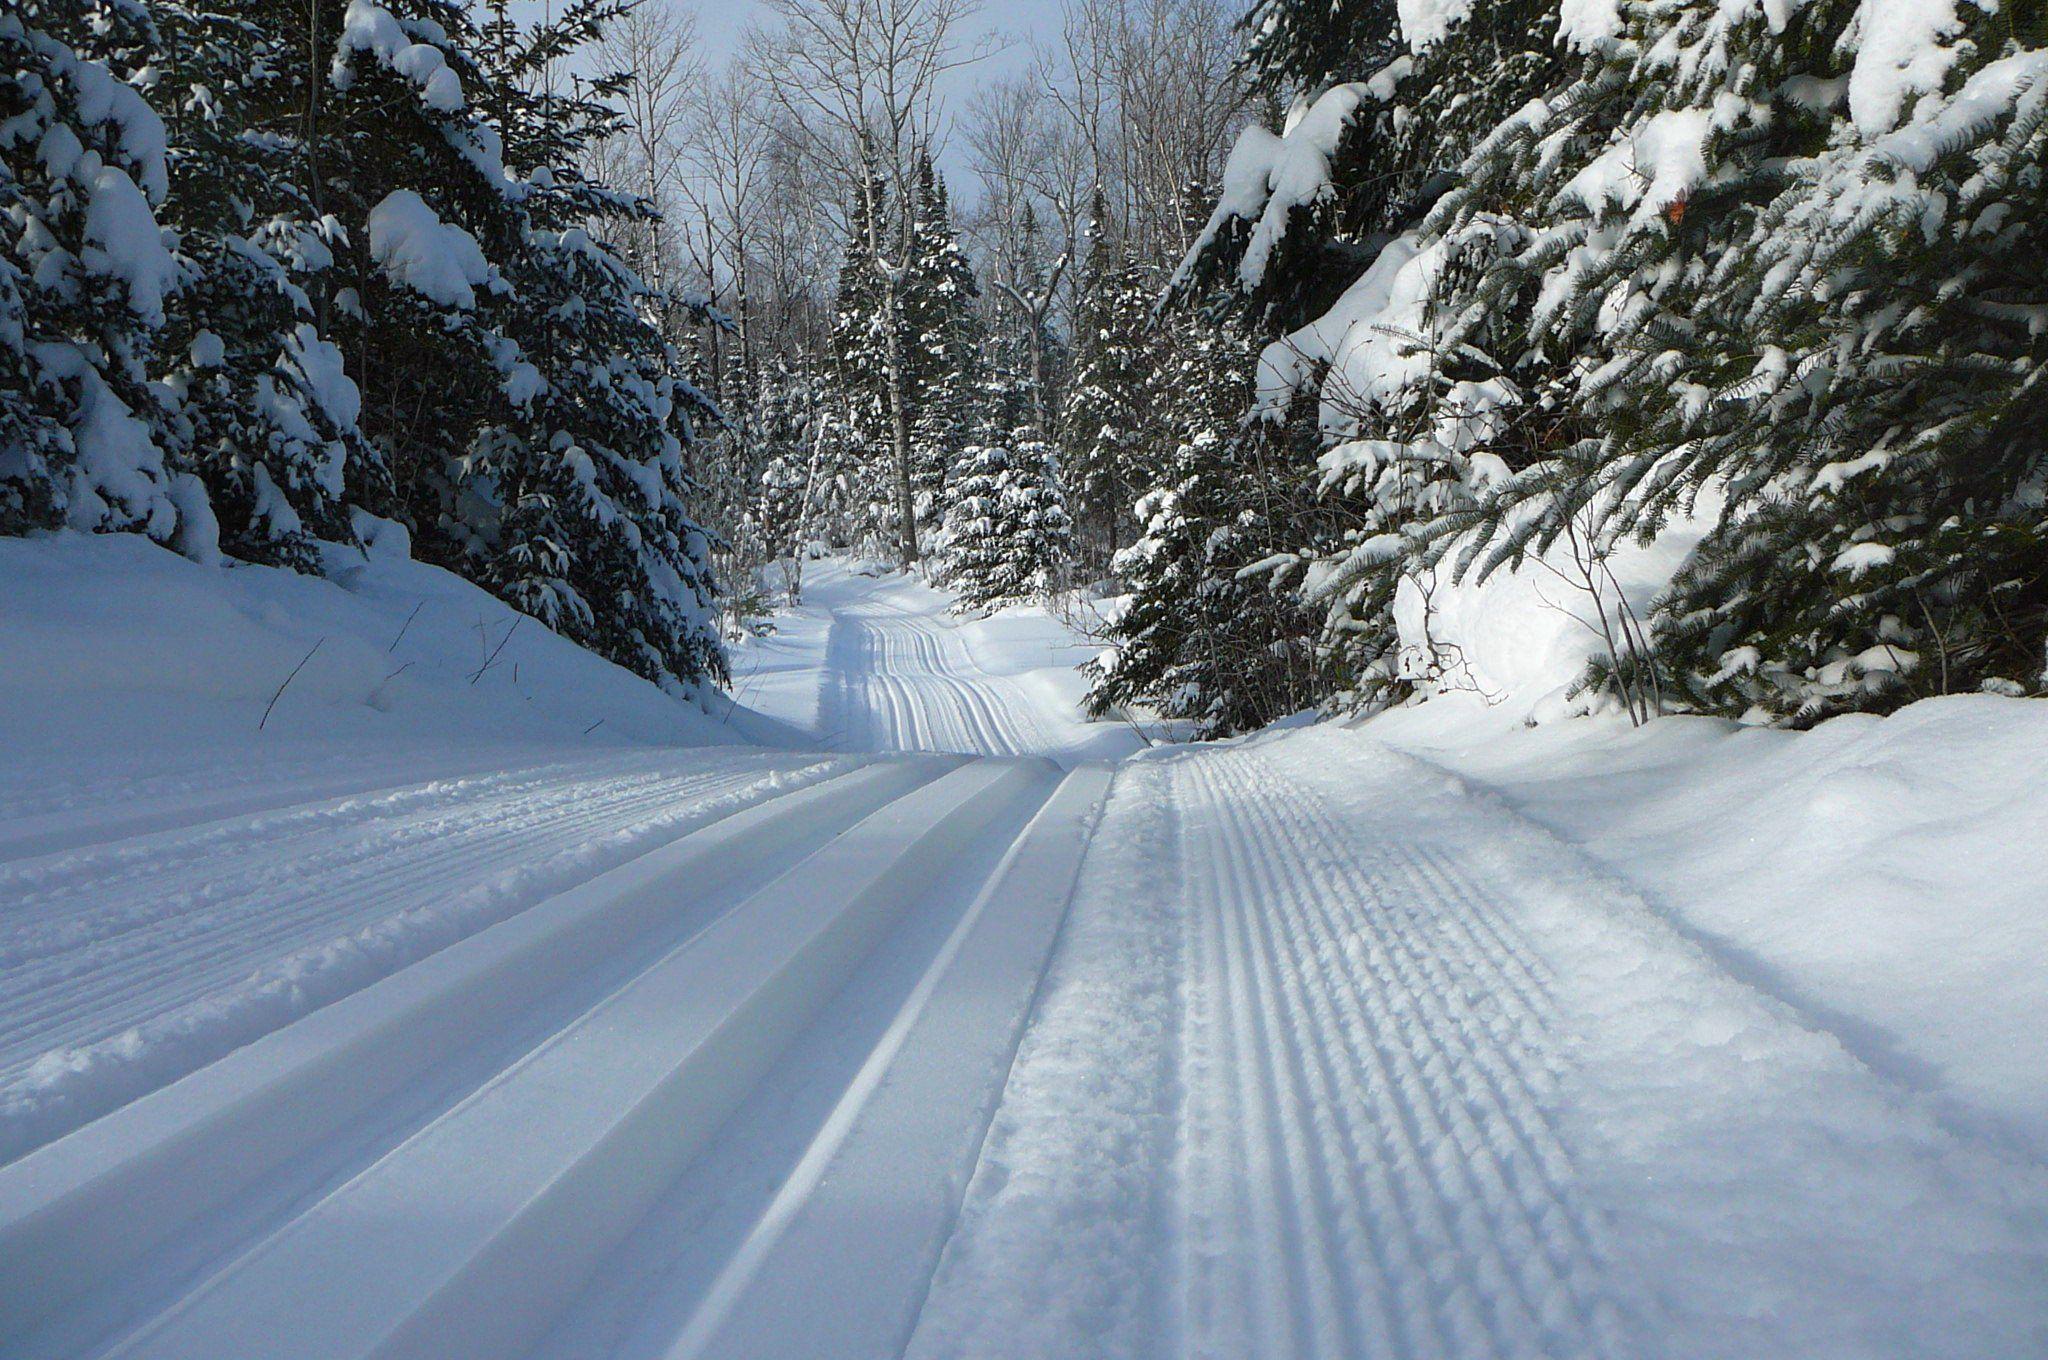 Cross Country Skiing Northeastern Minnesota Cross Country Skiing Ski Trails Lake Tahoe Skiing